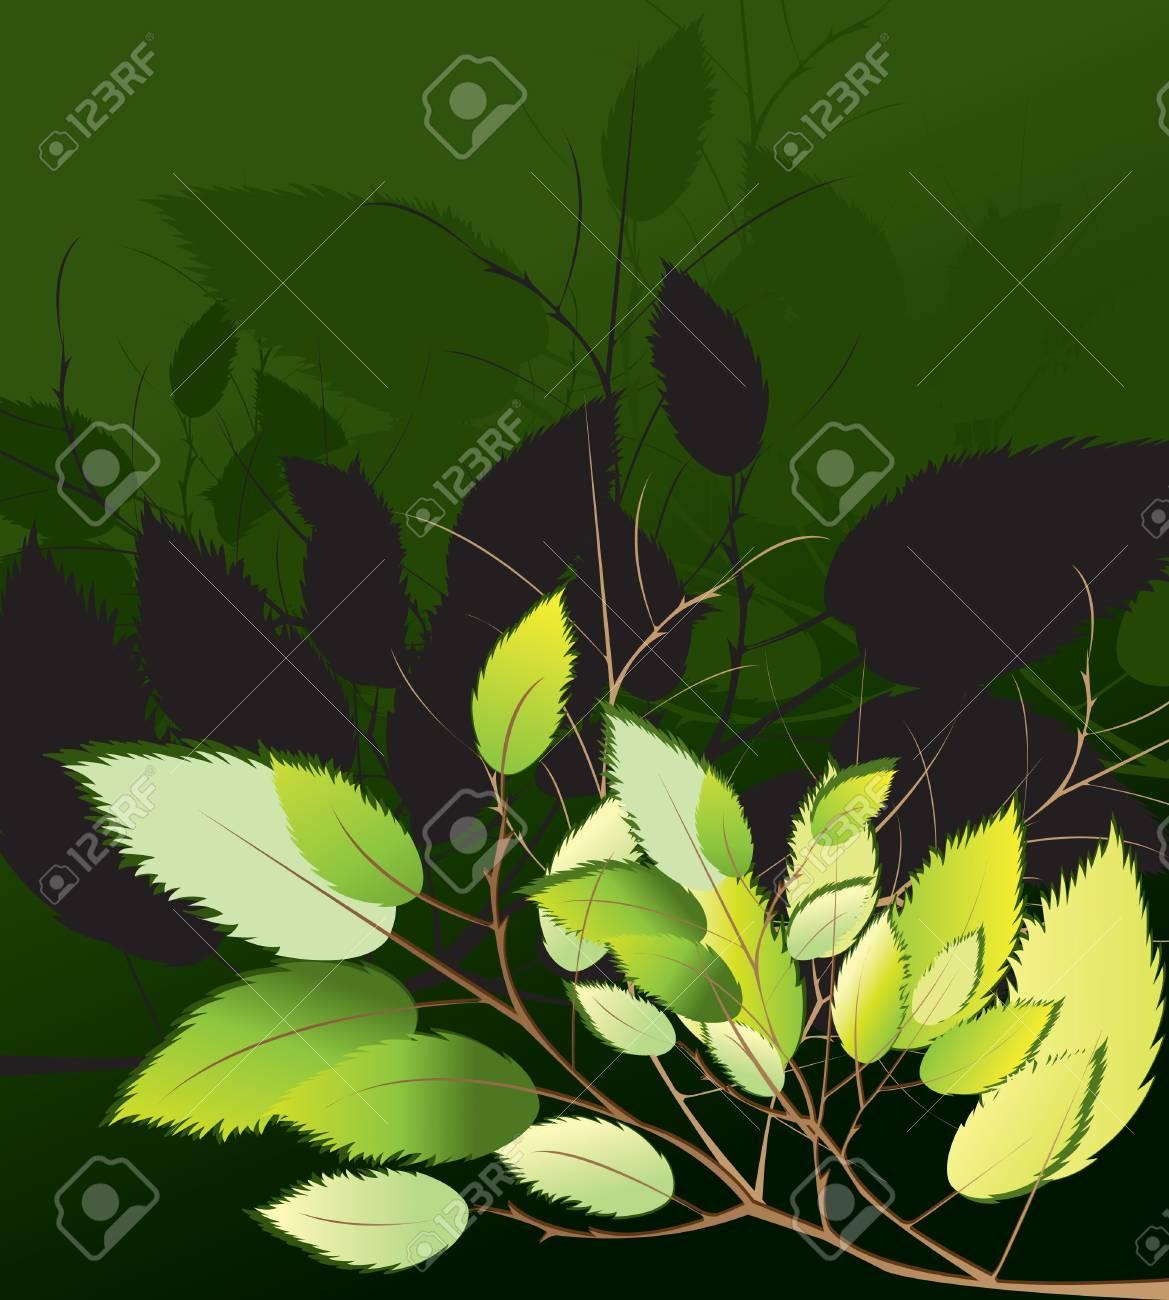 Leaf Vector Illustration Stock Vector - 12473203